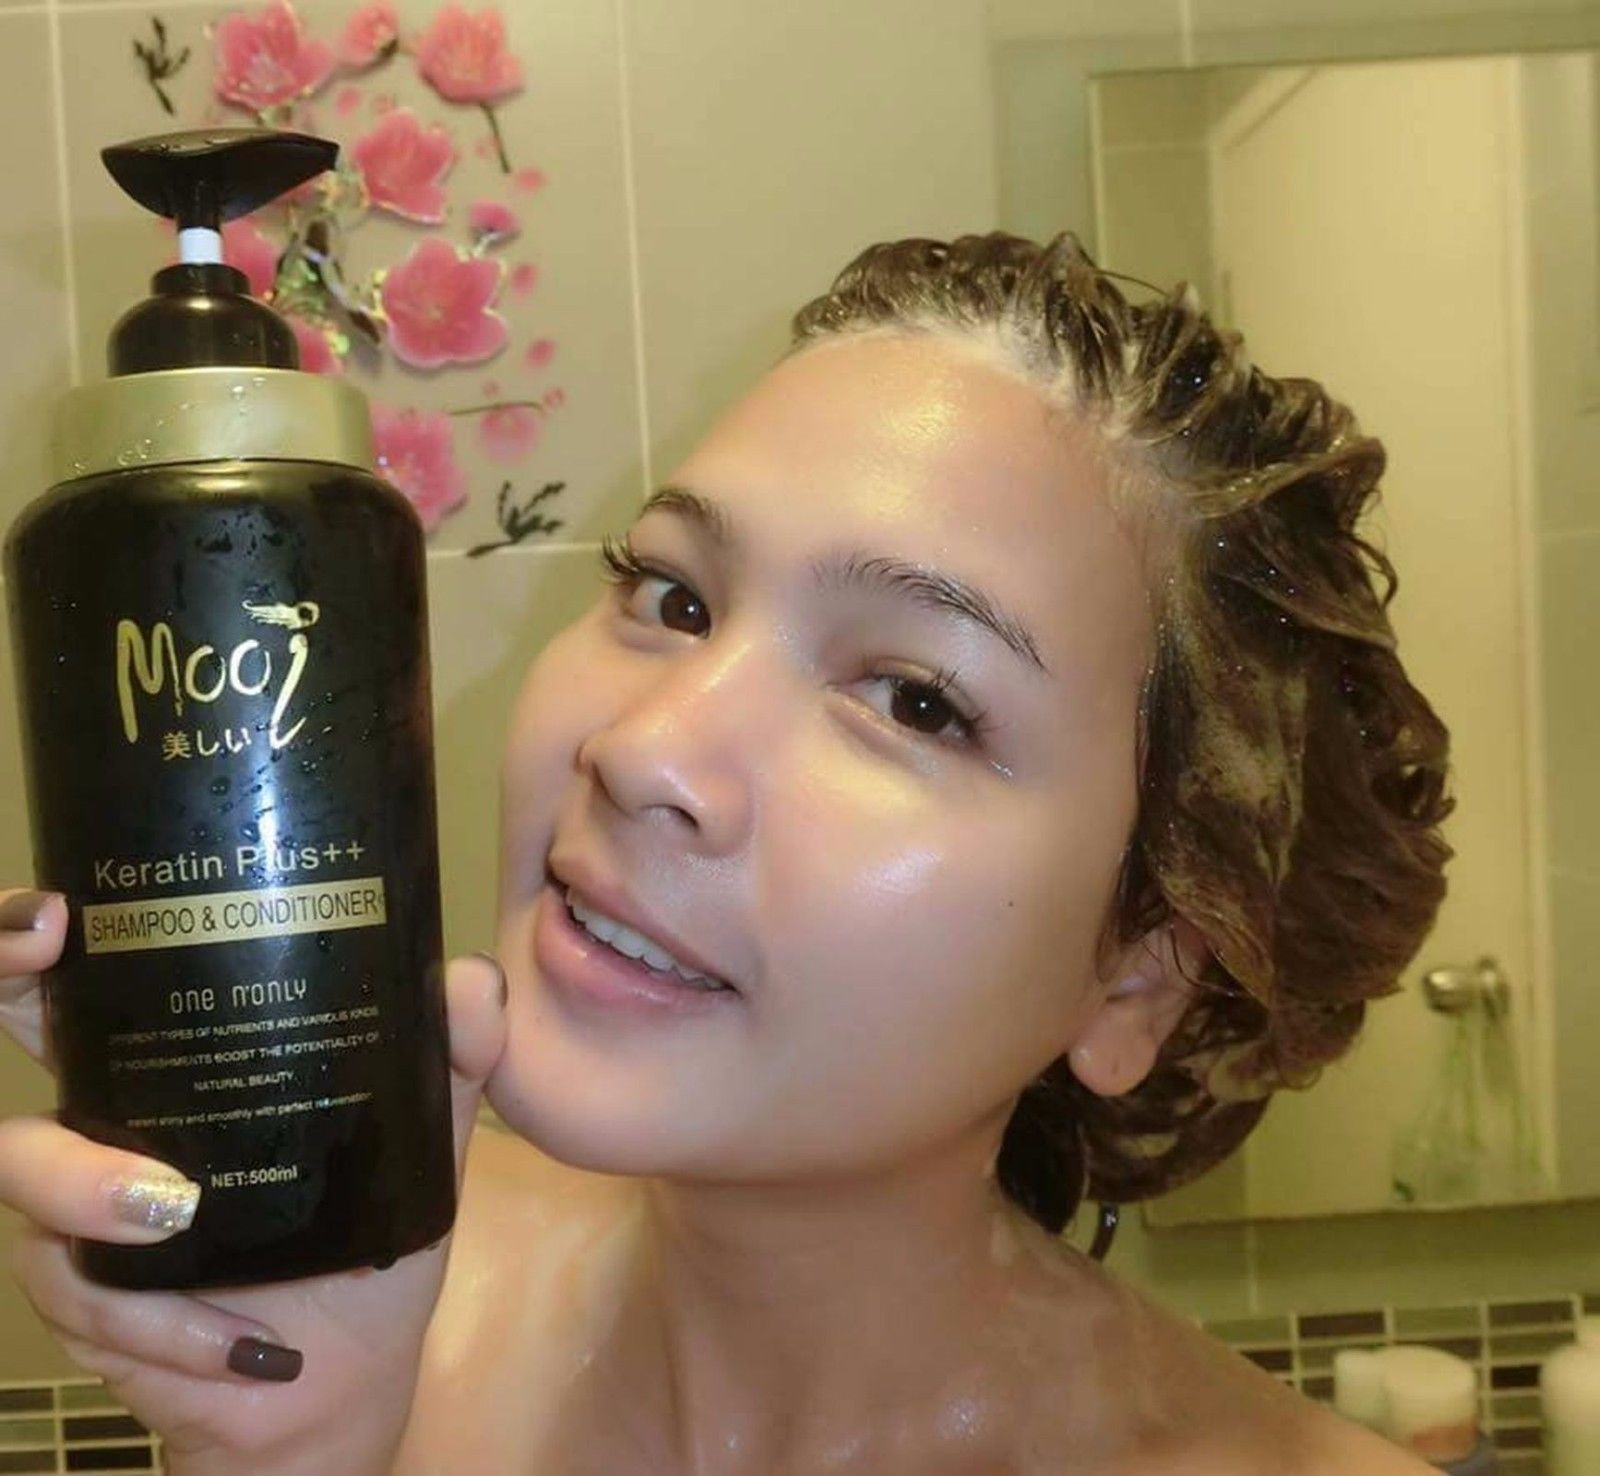 Mooi Keratin Plus++ Shampoo&Conditioner Hair Healthy Treatments 500ml.